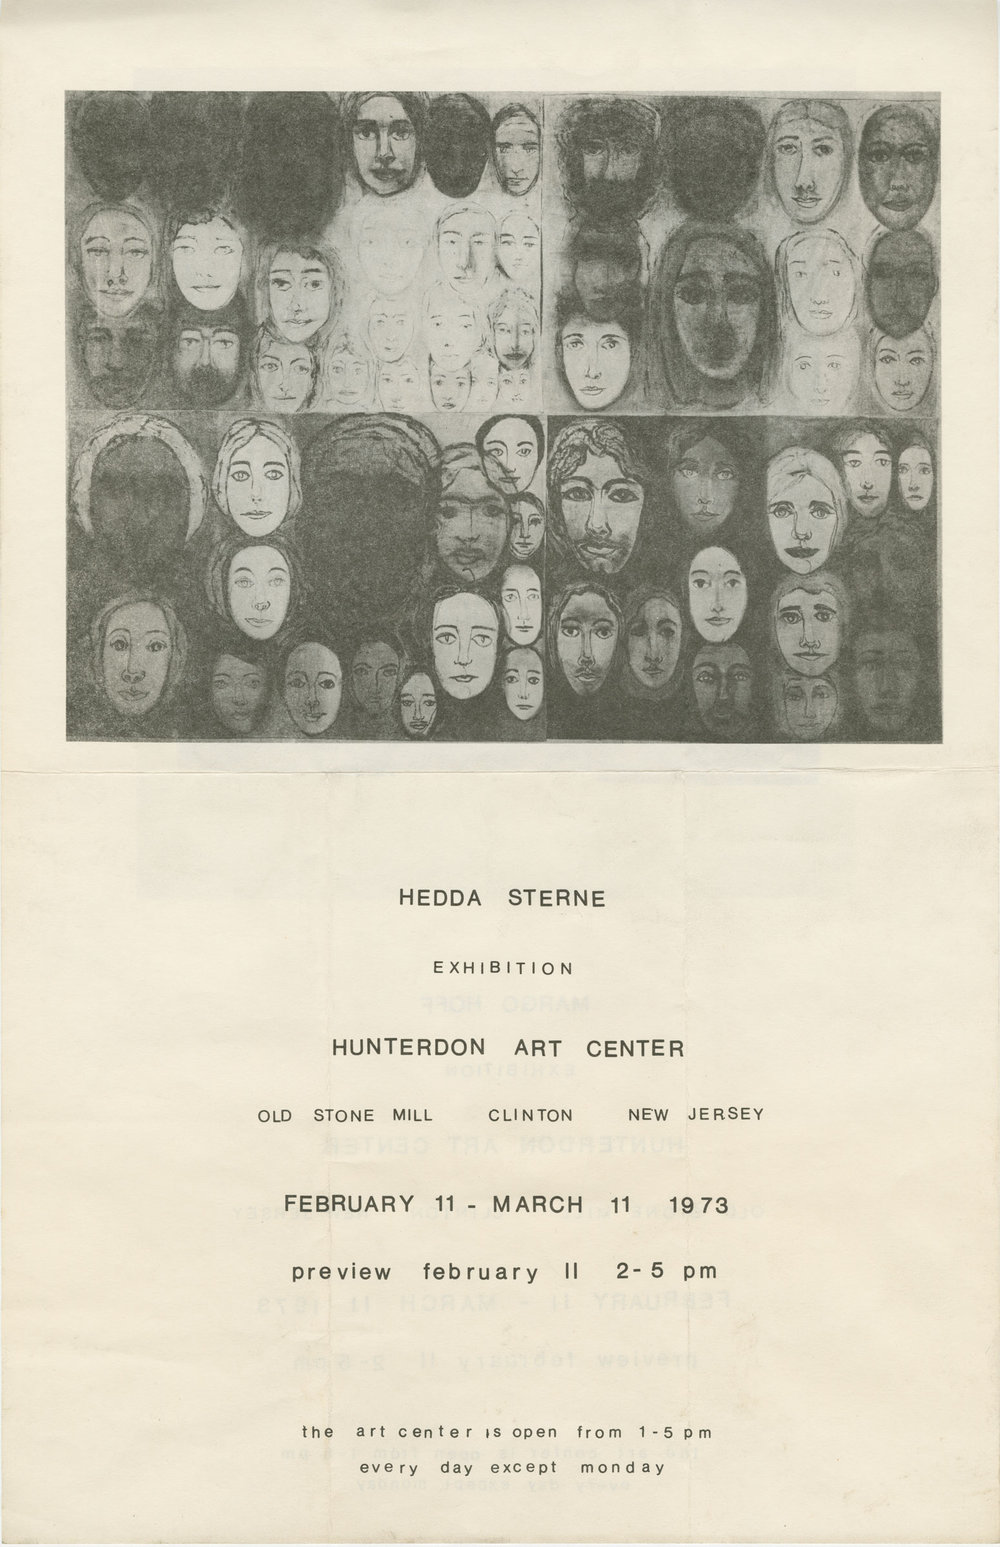 hedda-sterne-exhibition-1973.02.jpg